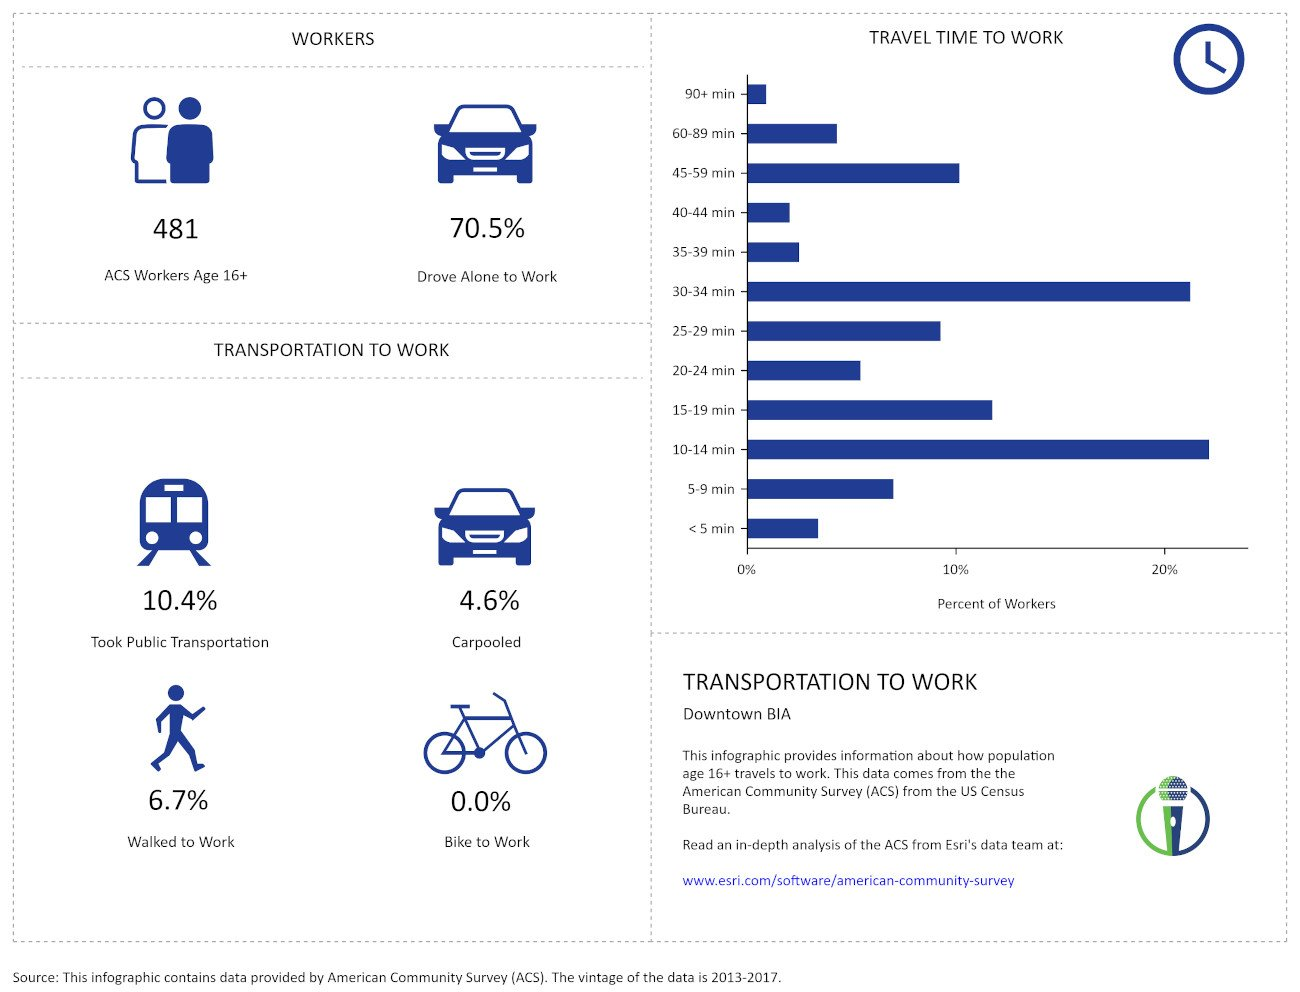 DSMA Transportation to Work